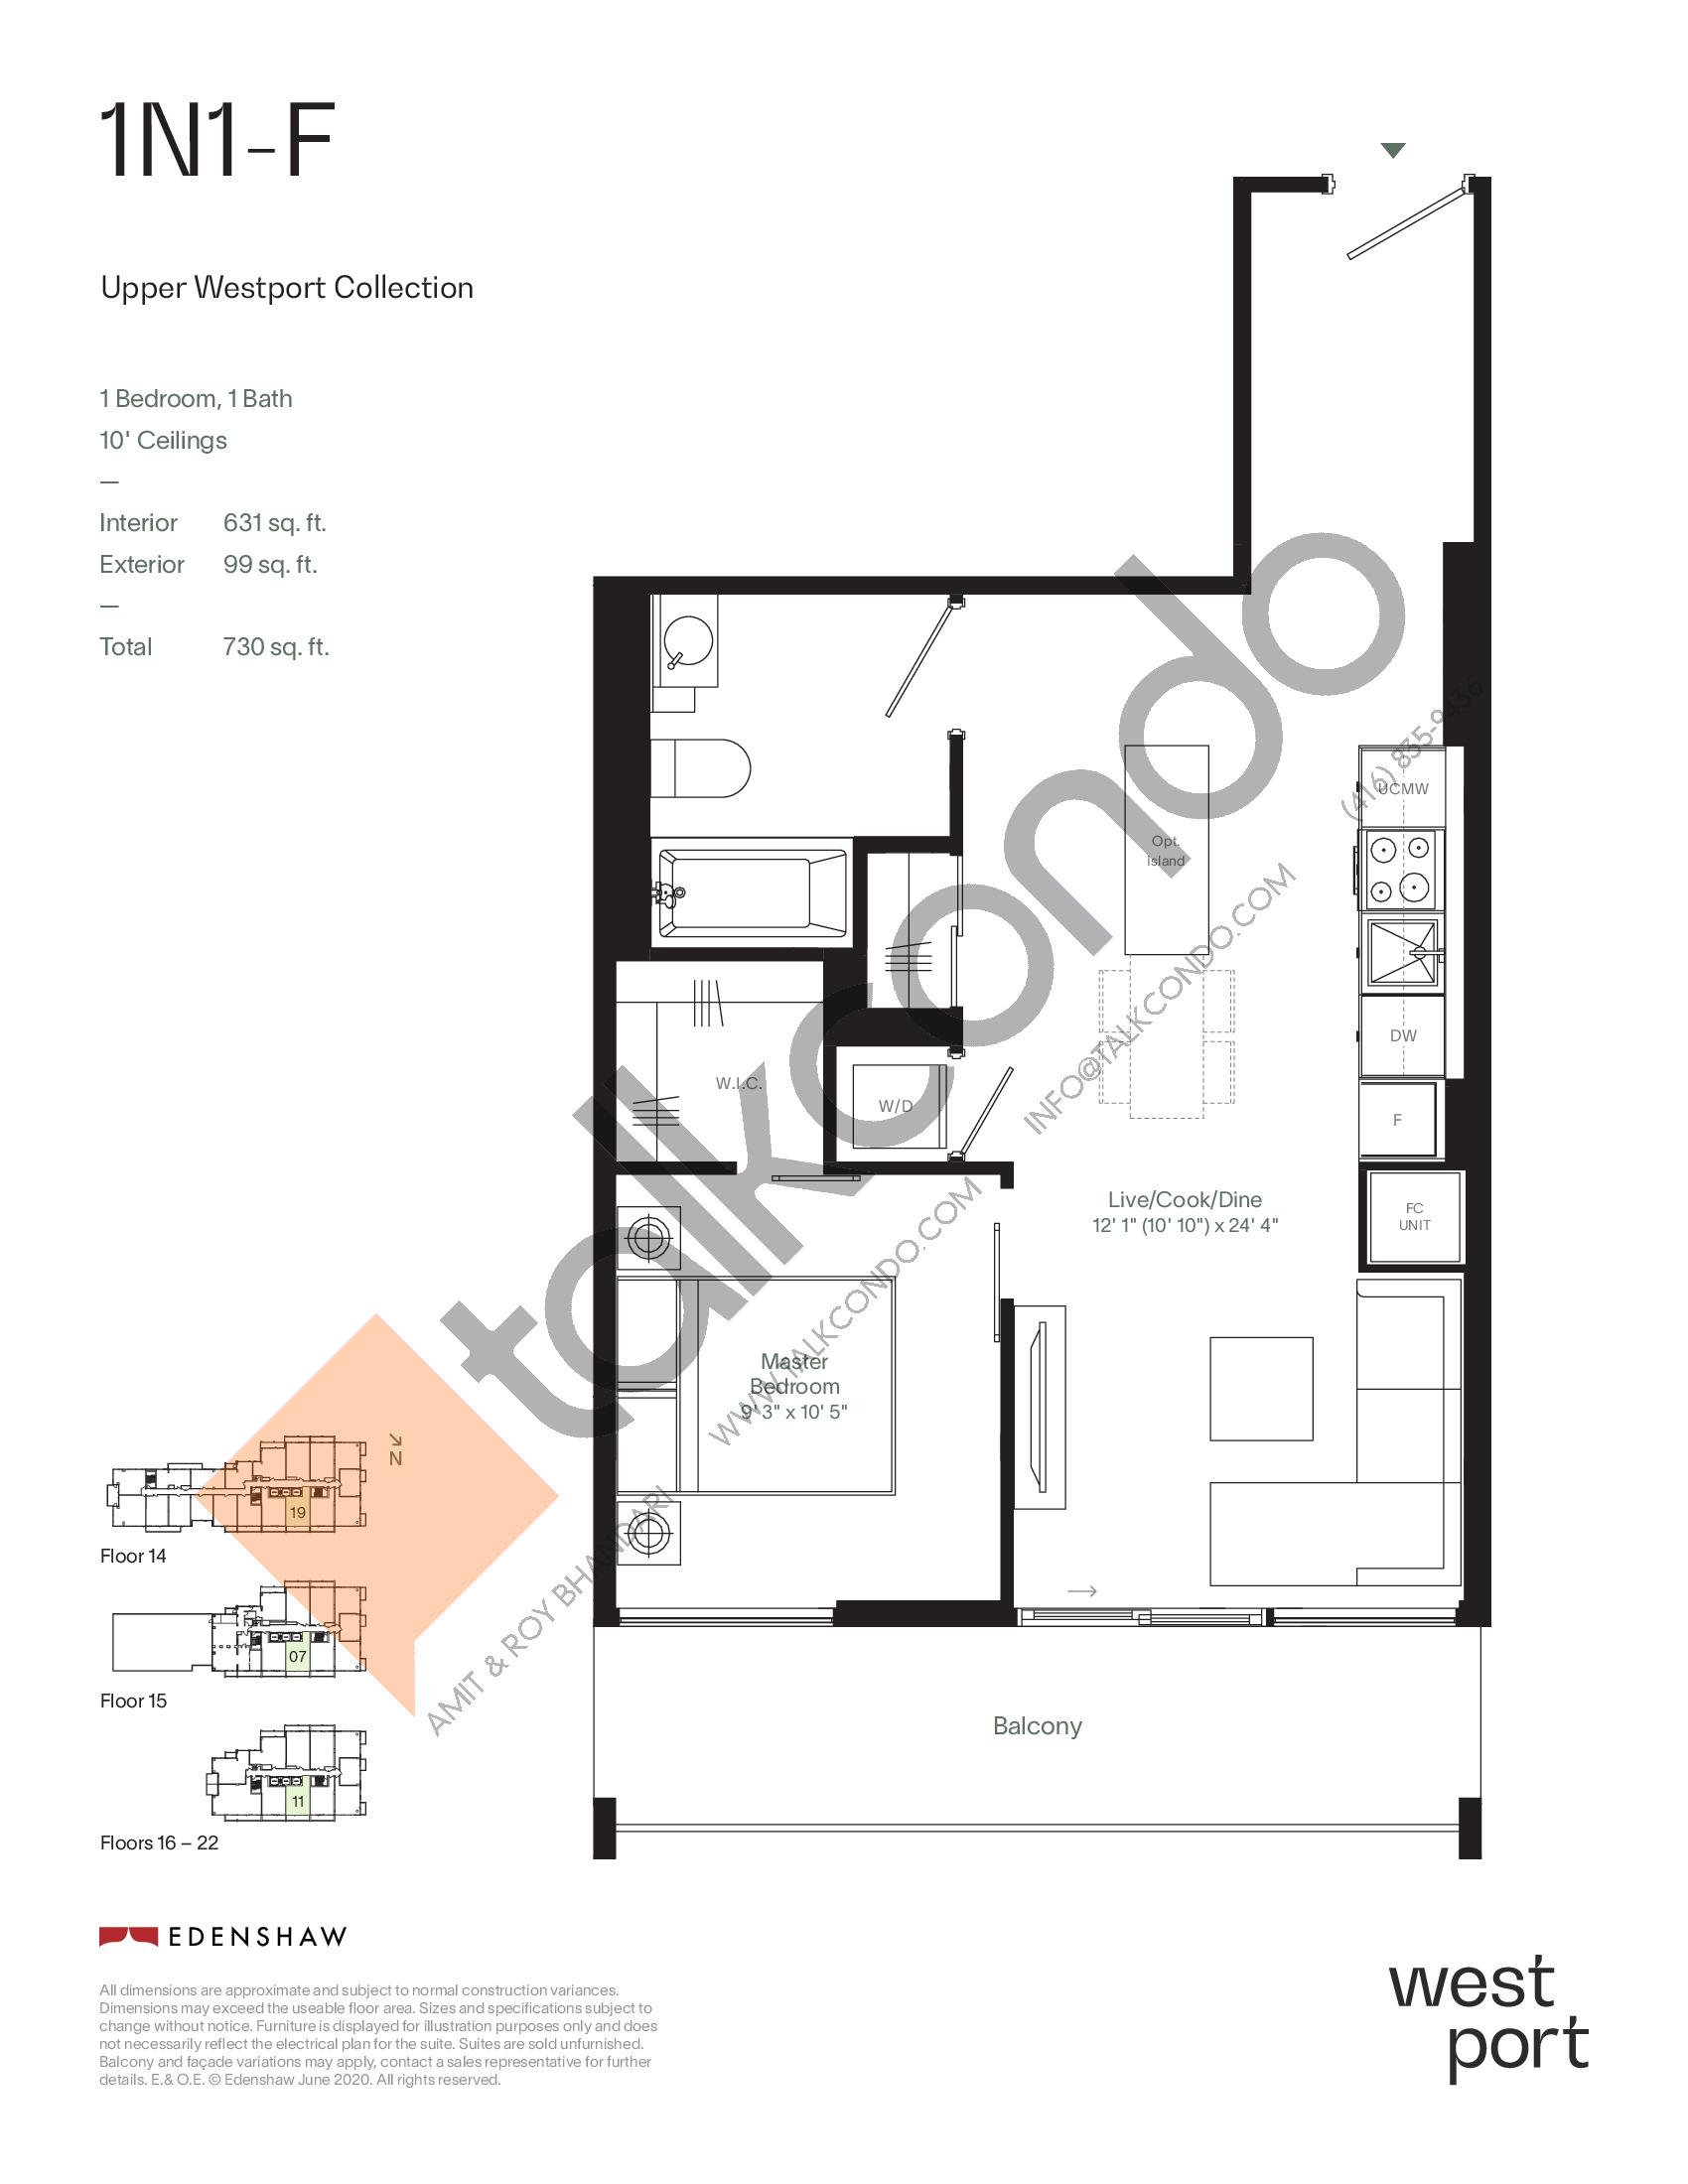 1N1-F - Upper Westport Collection Floor Plan at Westport Condos - 631 sq.ft